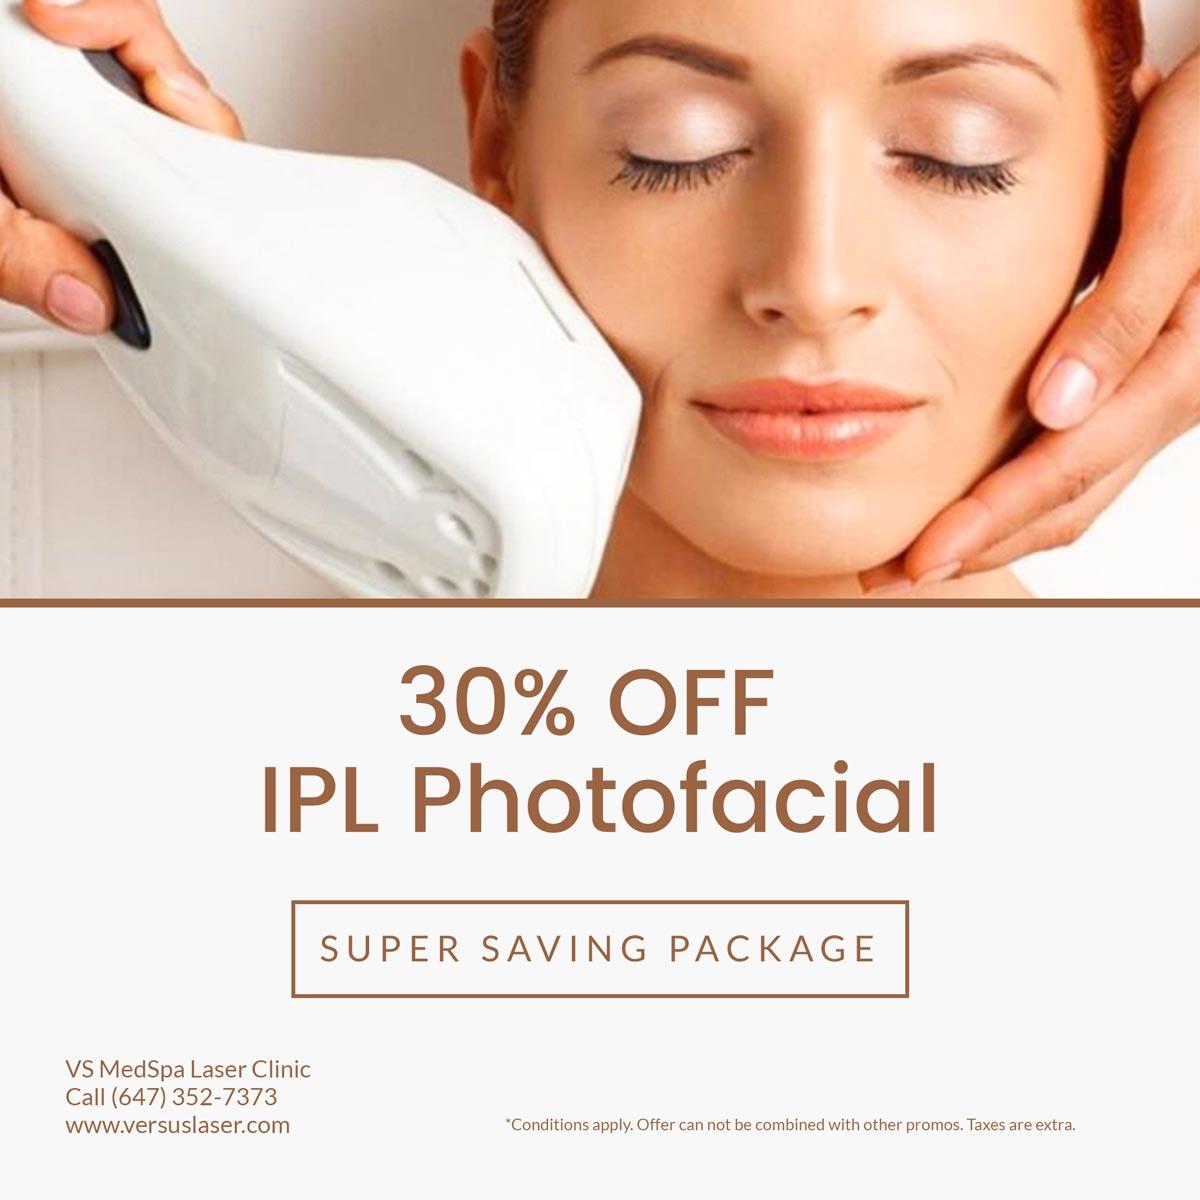 IPL Photorejuvenation treatment special sale